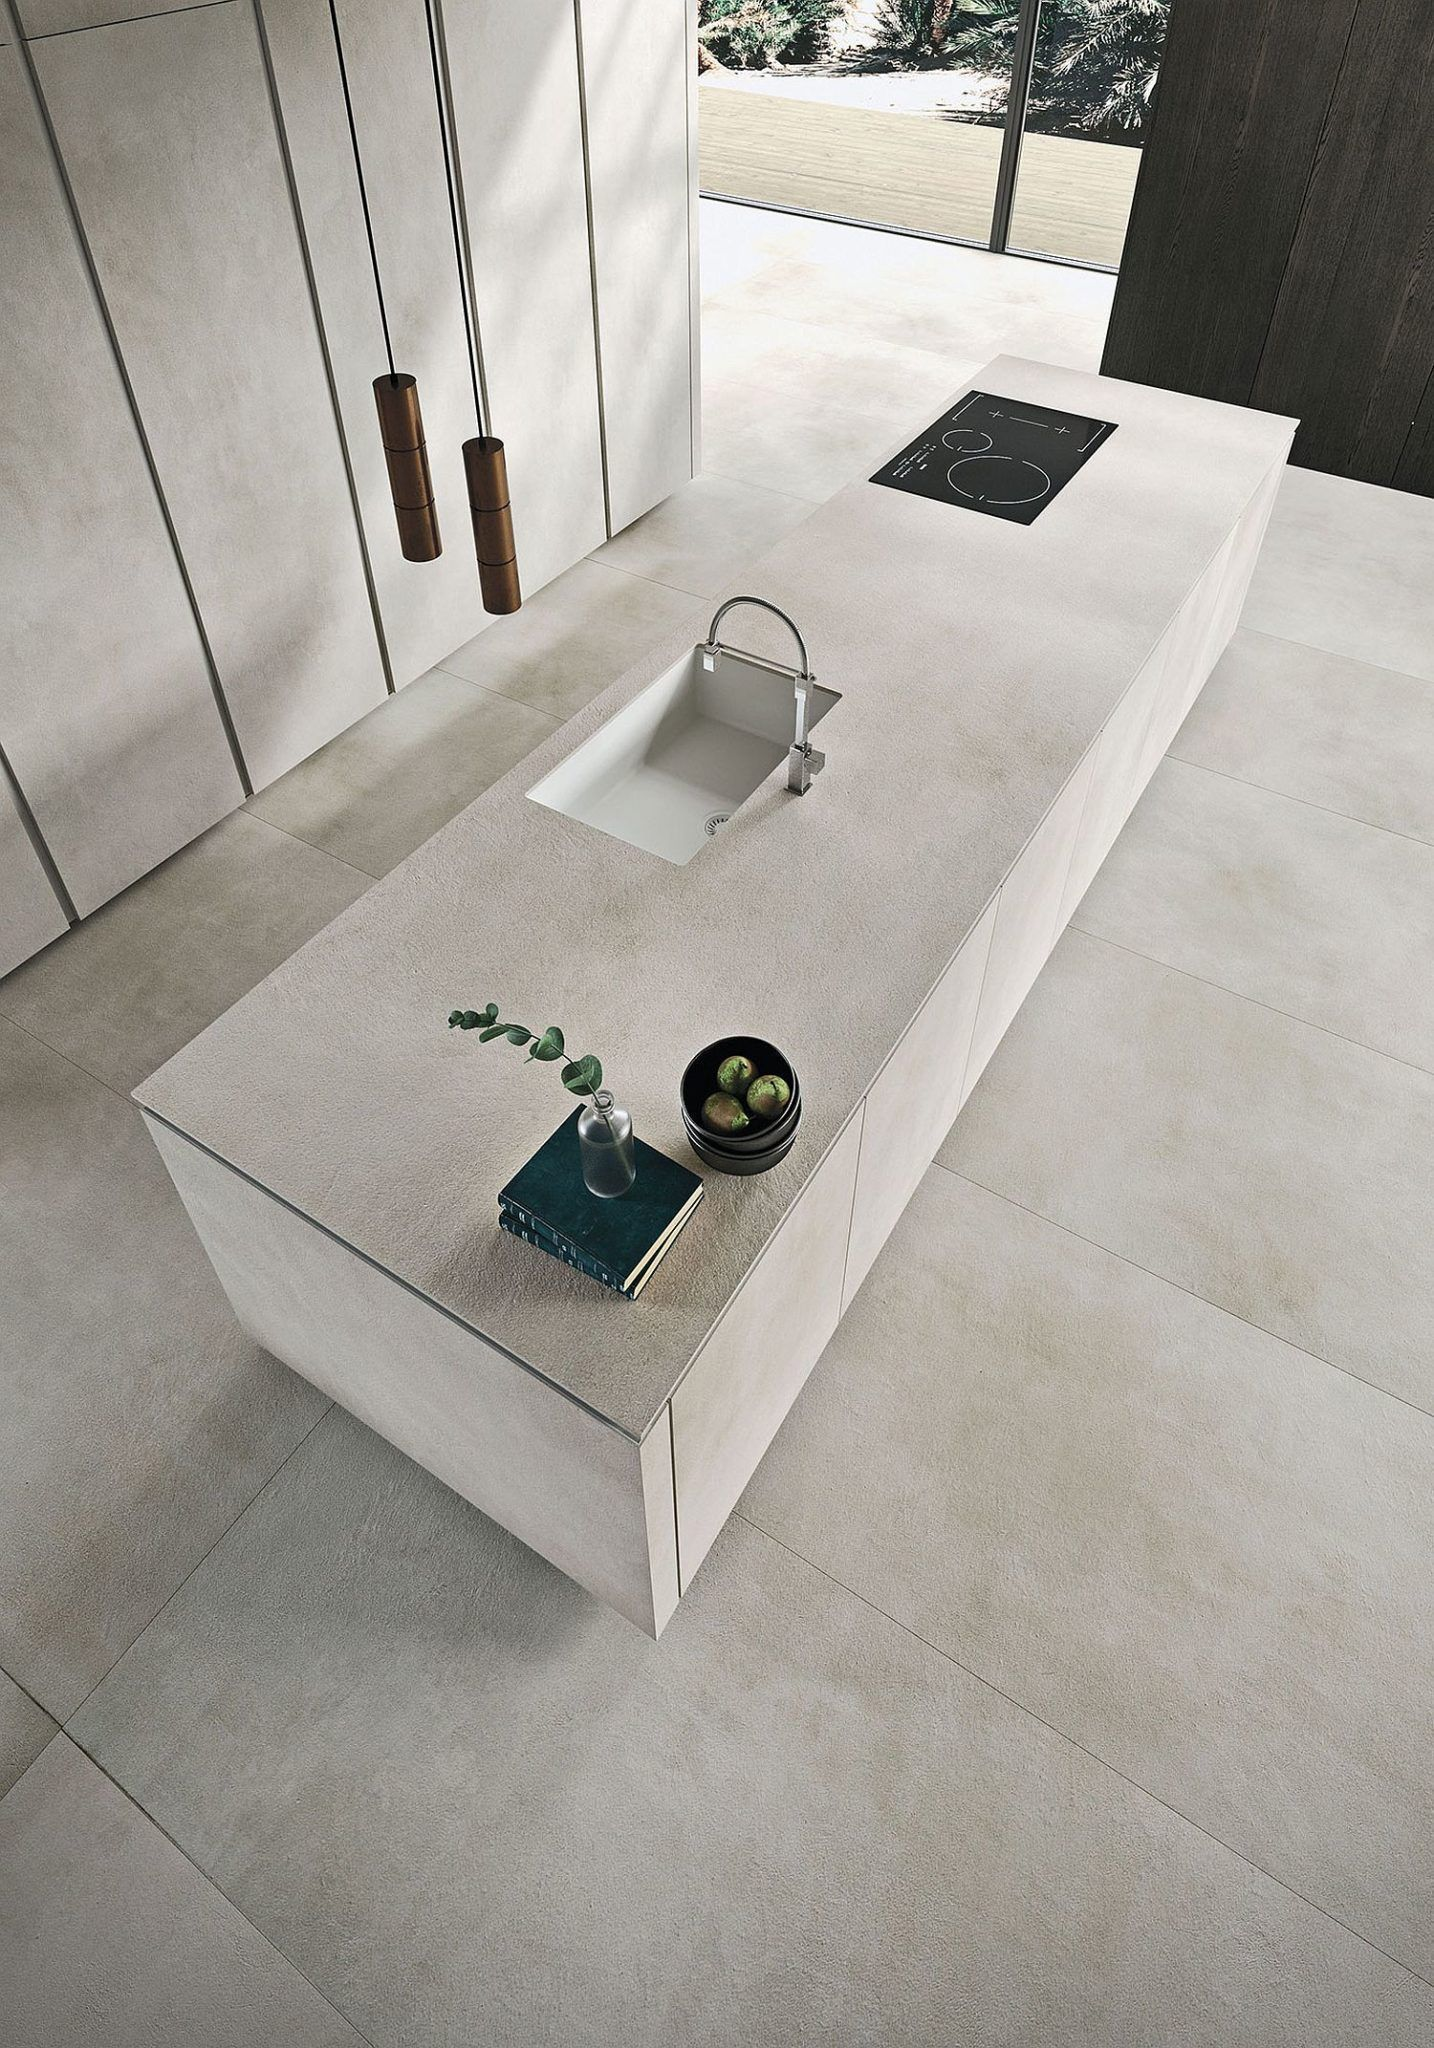 A Minimalist's Dream: Polished Way Materia Kitchen for the Urban Home #dream #Kitchen #materia #Minimalist #polished #urban